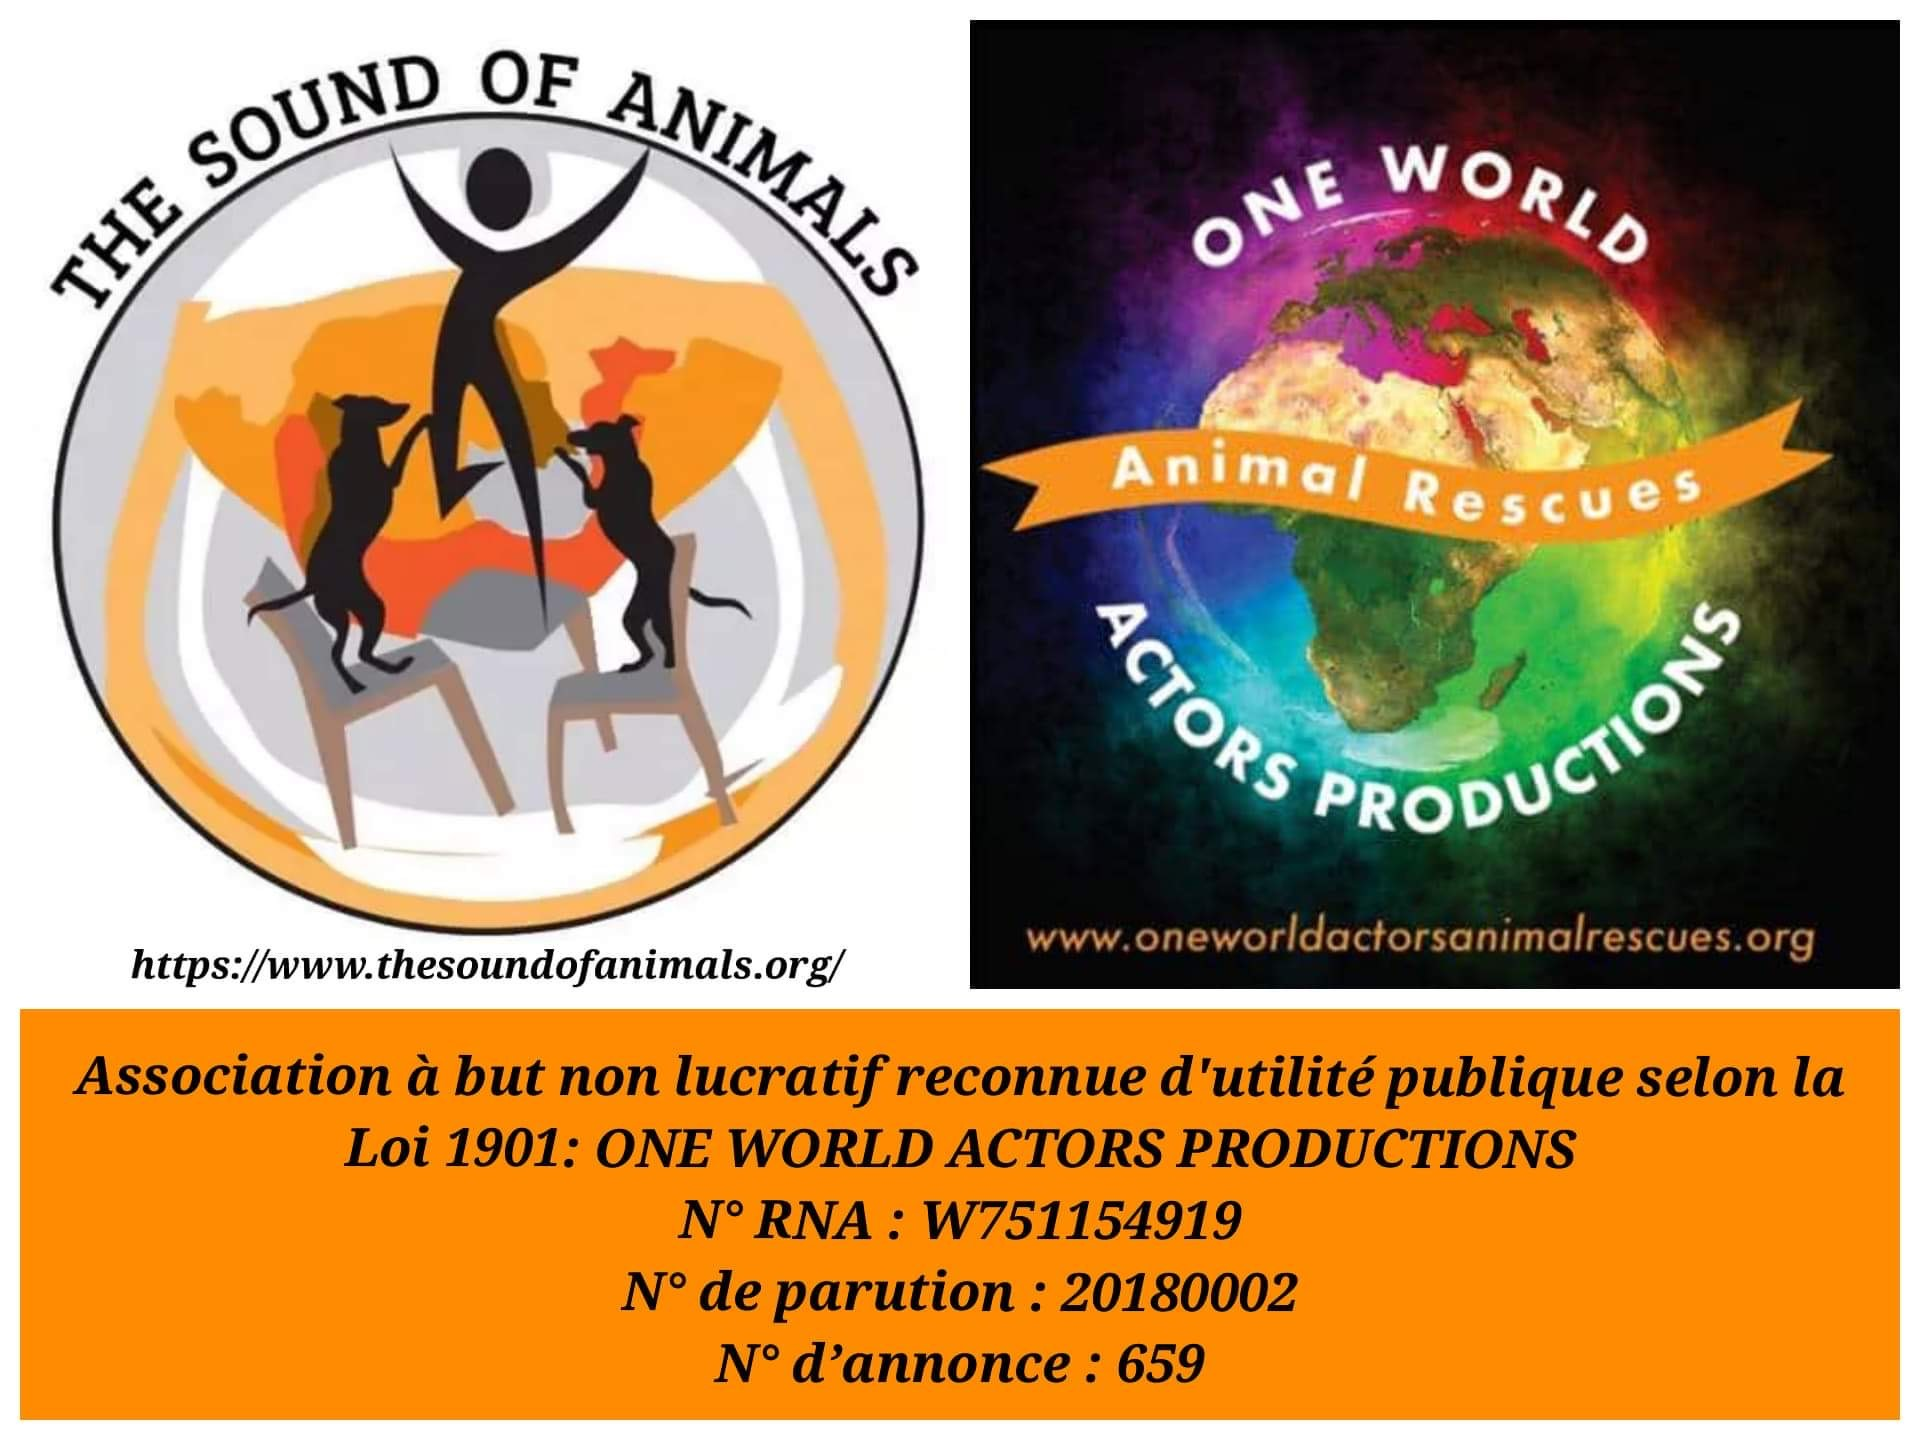 The Sound of Animals